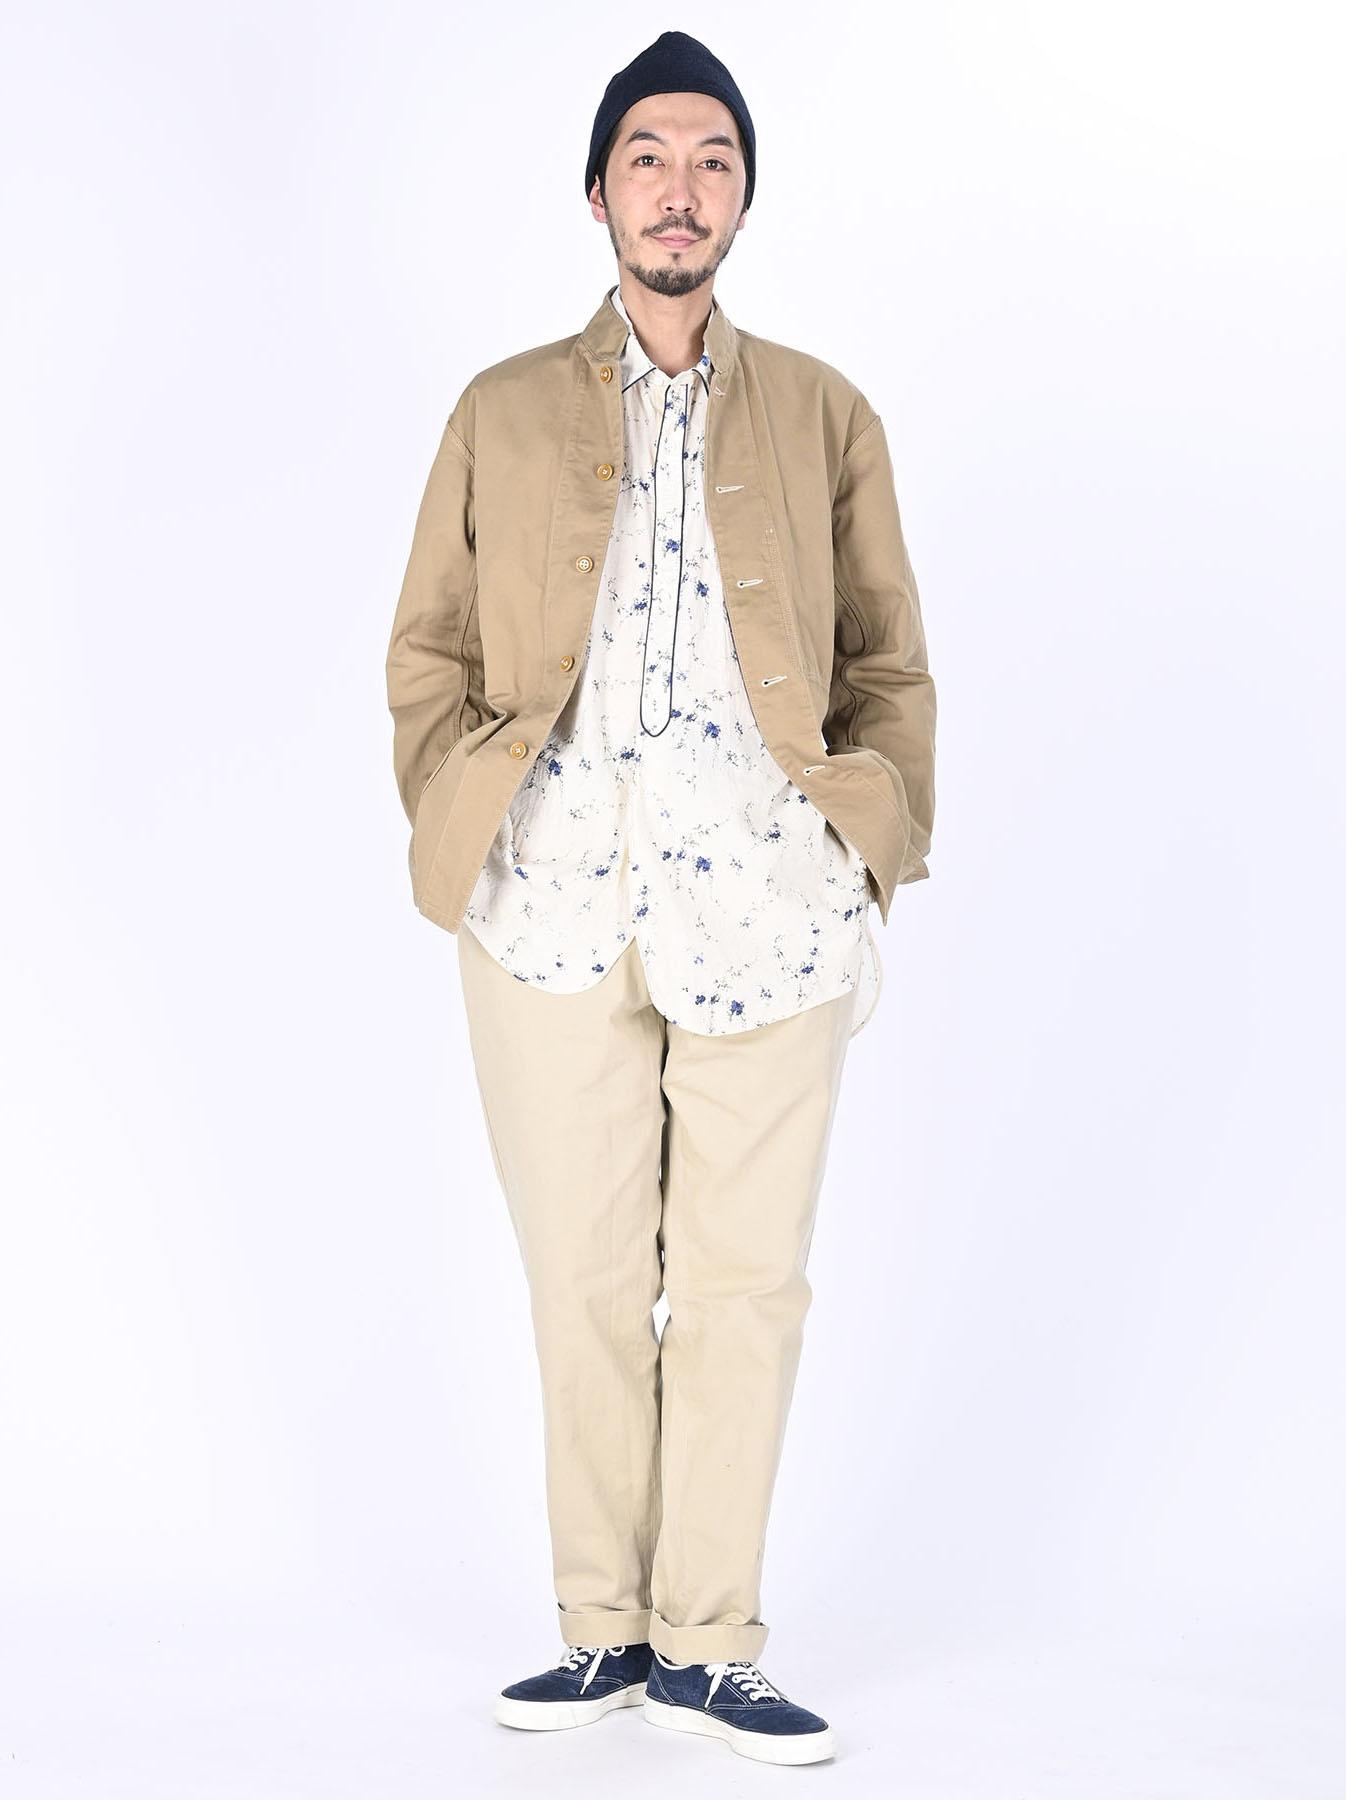 Okome Chino 908 Shirt Jacket-3